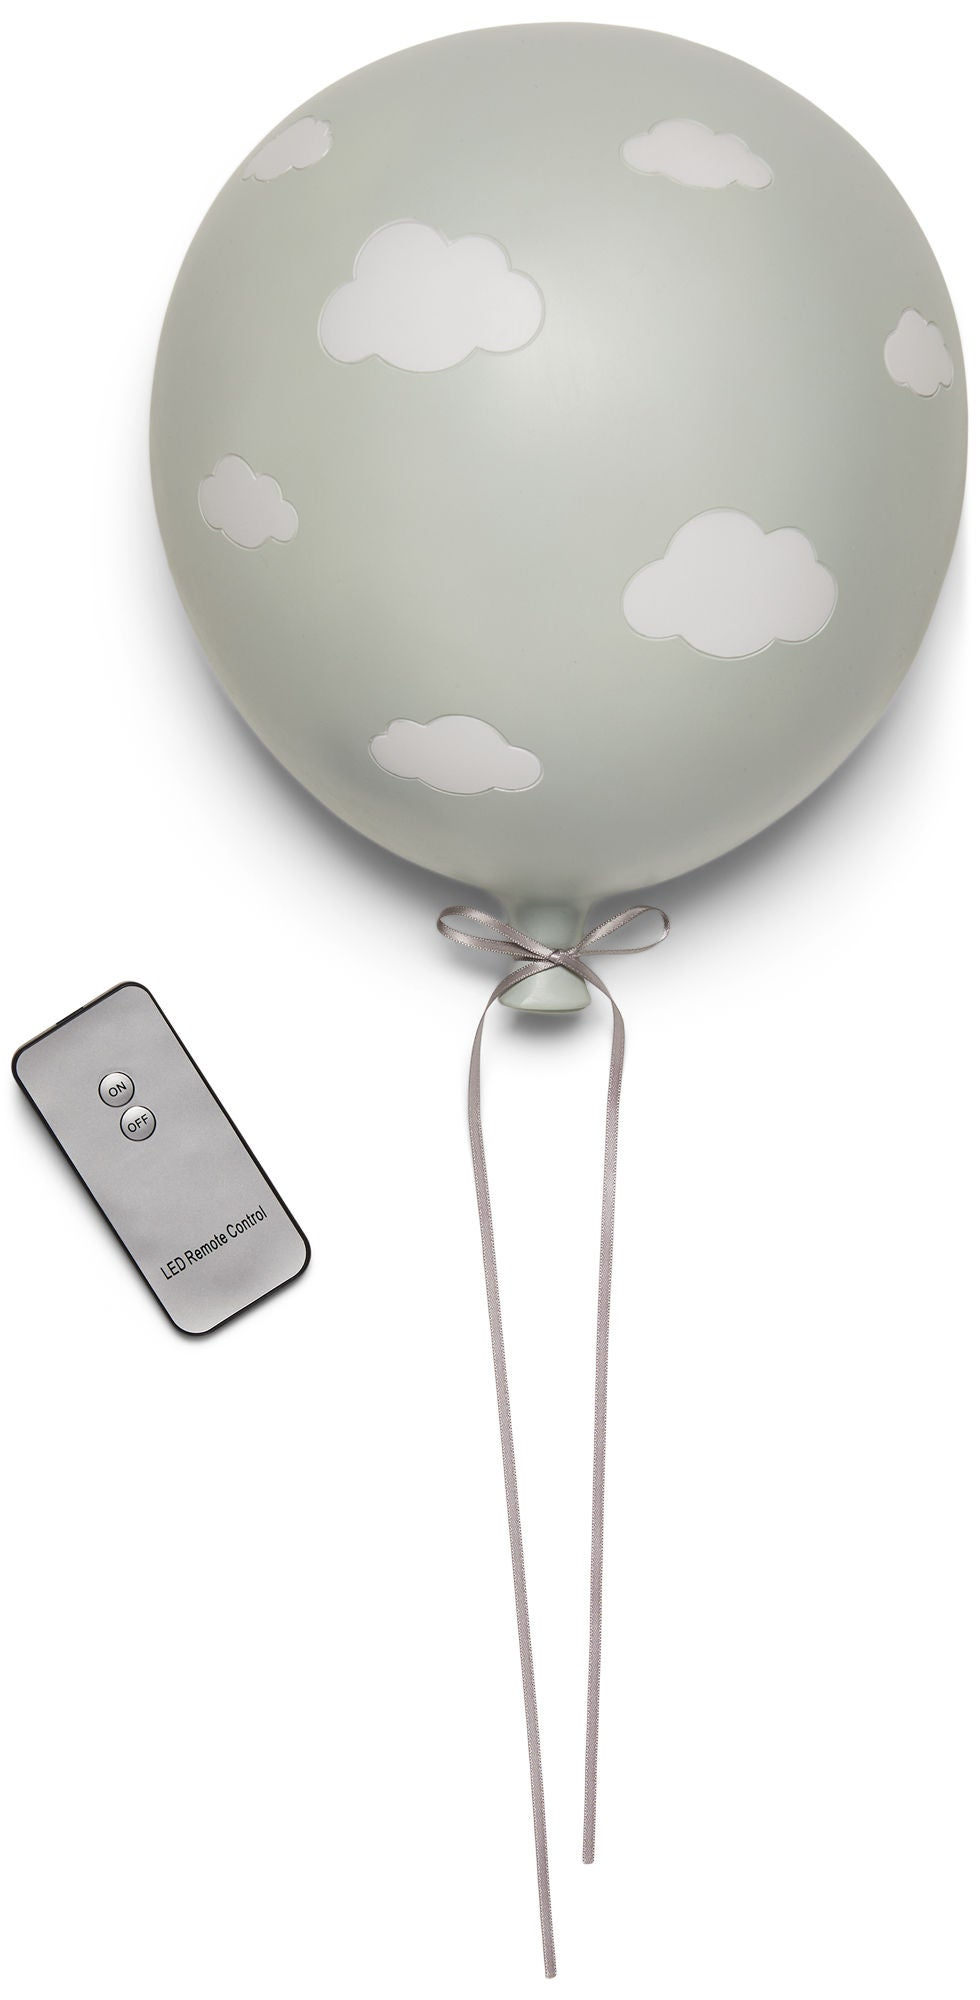 Lilou Lilou Seinävalaisin Ilmapallo Pilvi, Grey/White